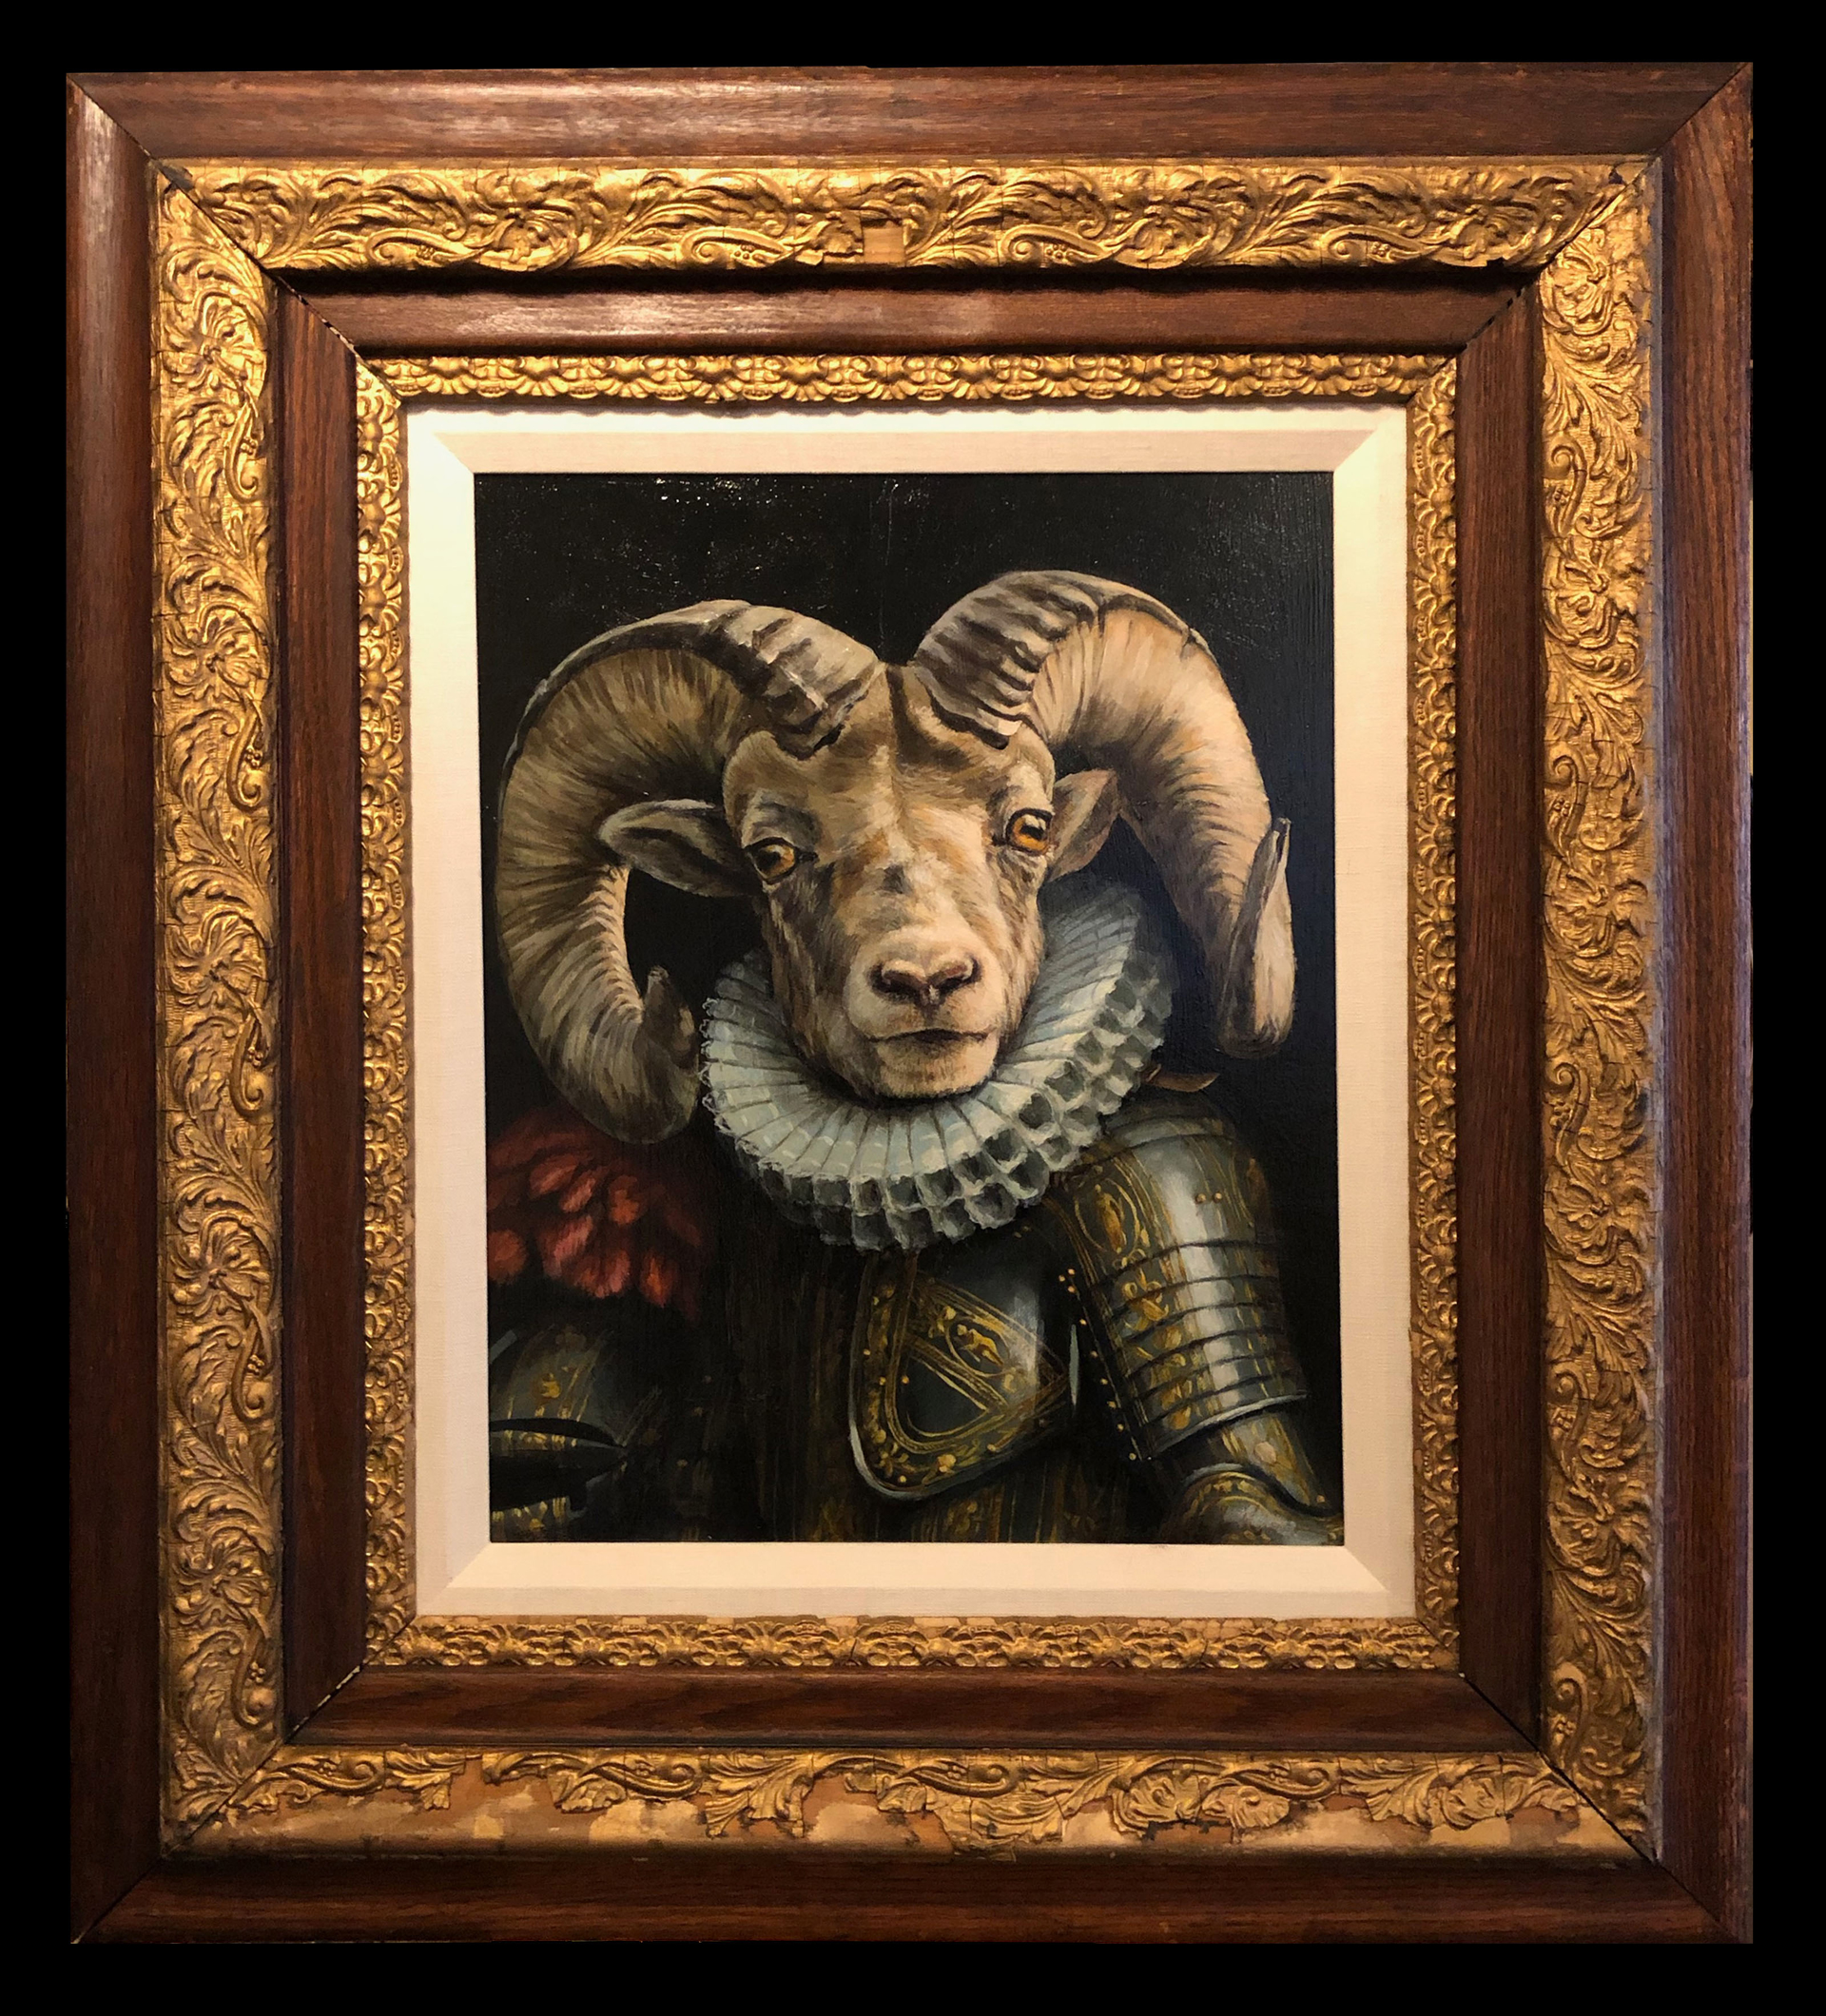 Bighorn Ram in Armour by Cassandra Kim